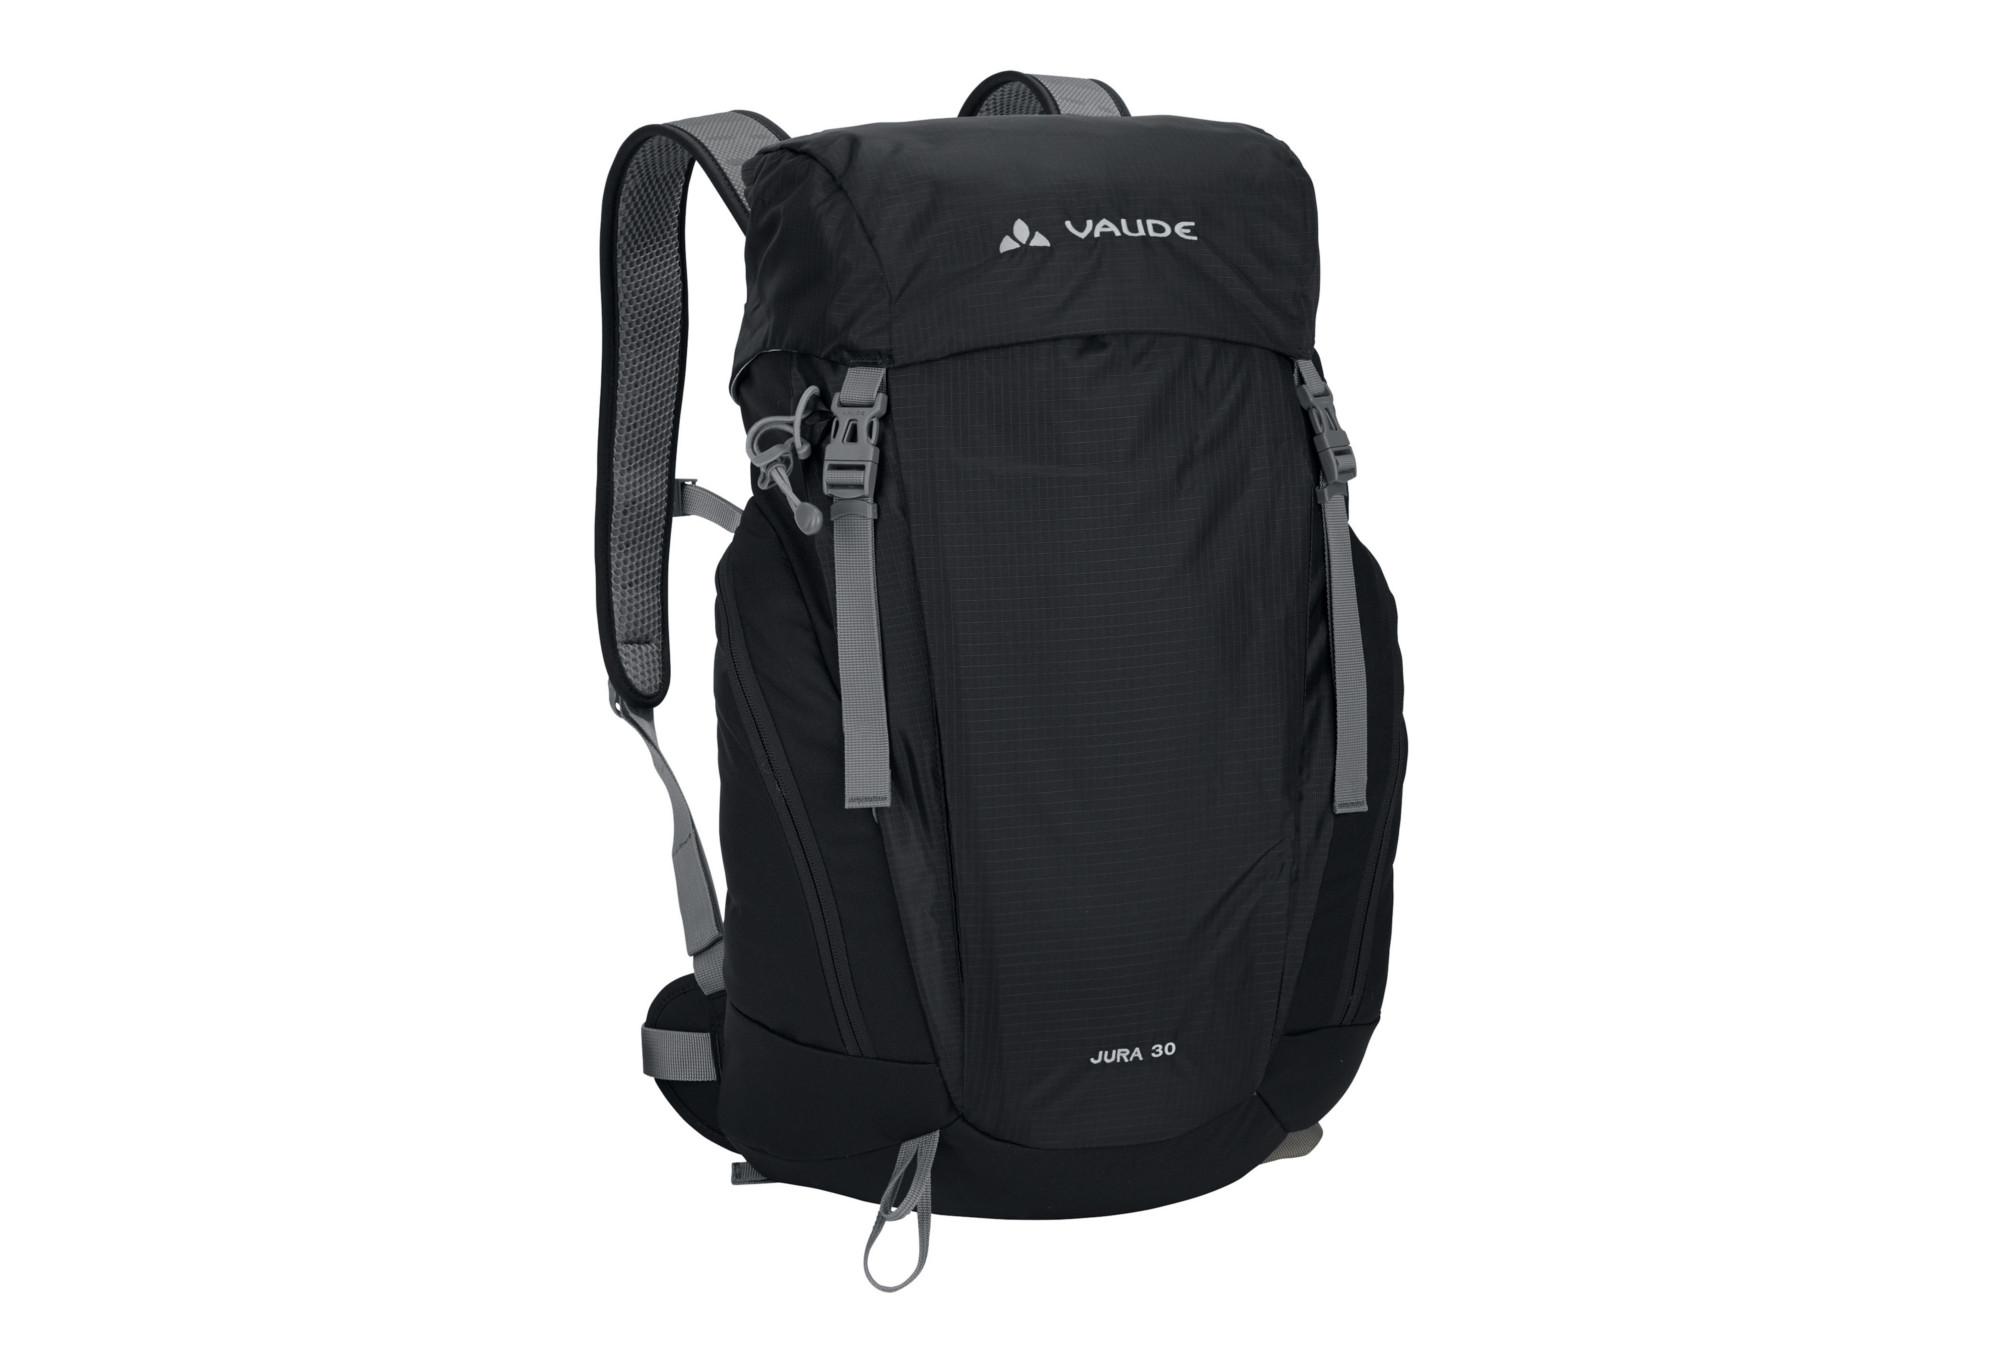 VAUDE Jura 30 Backpack